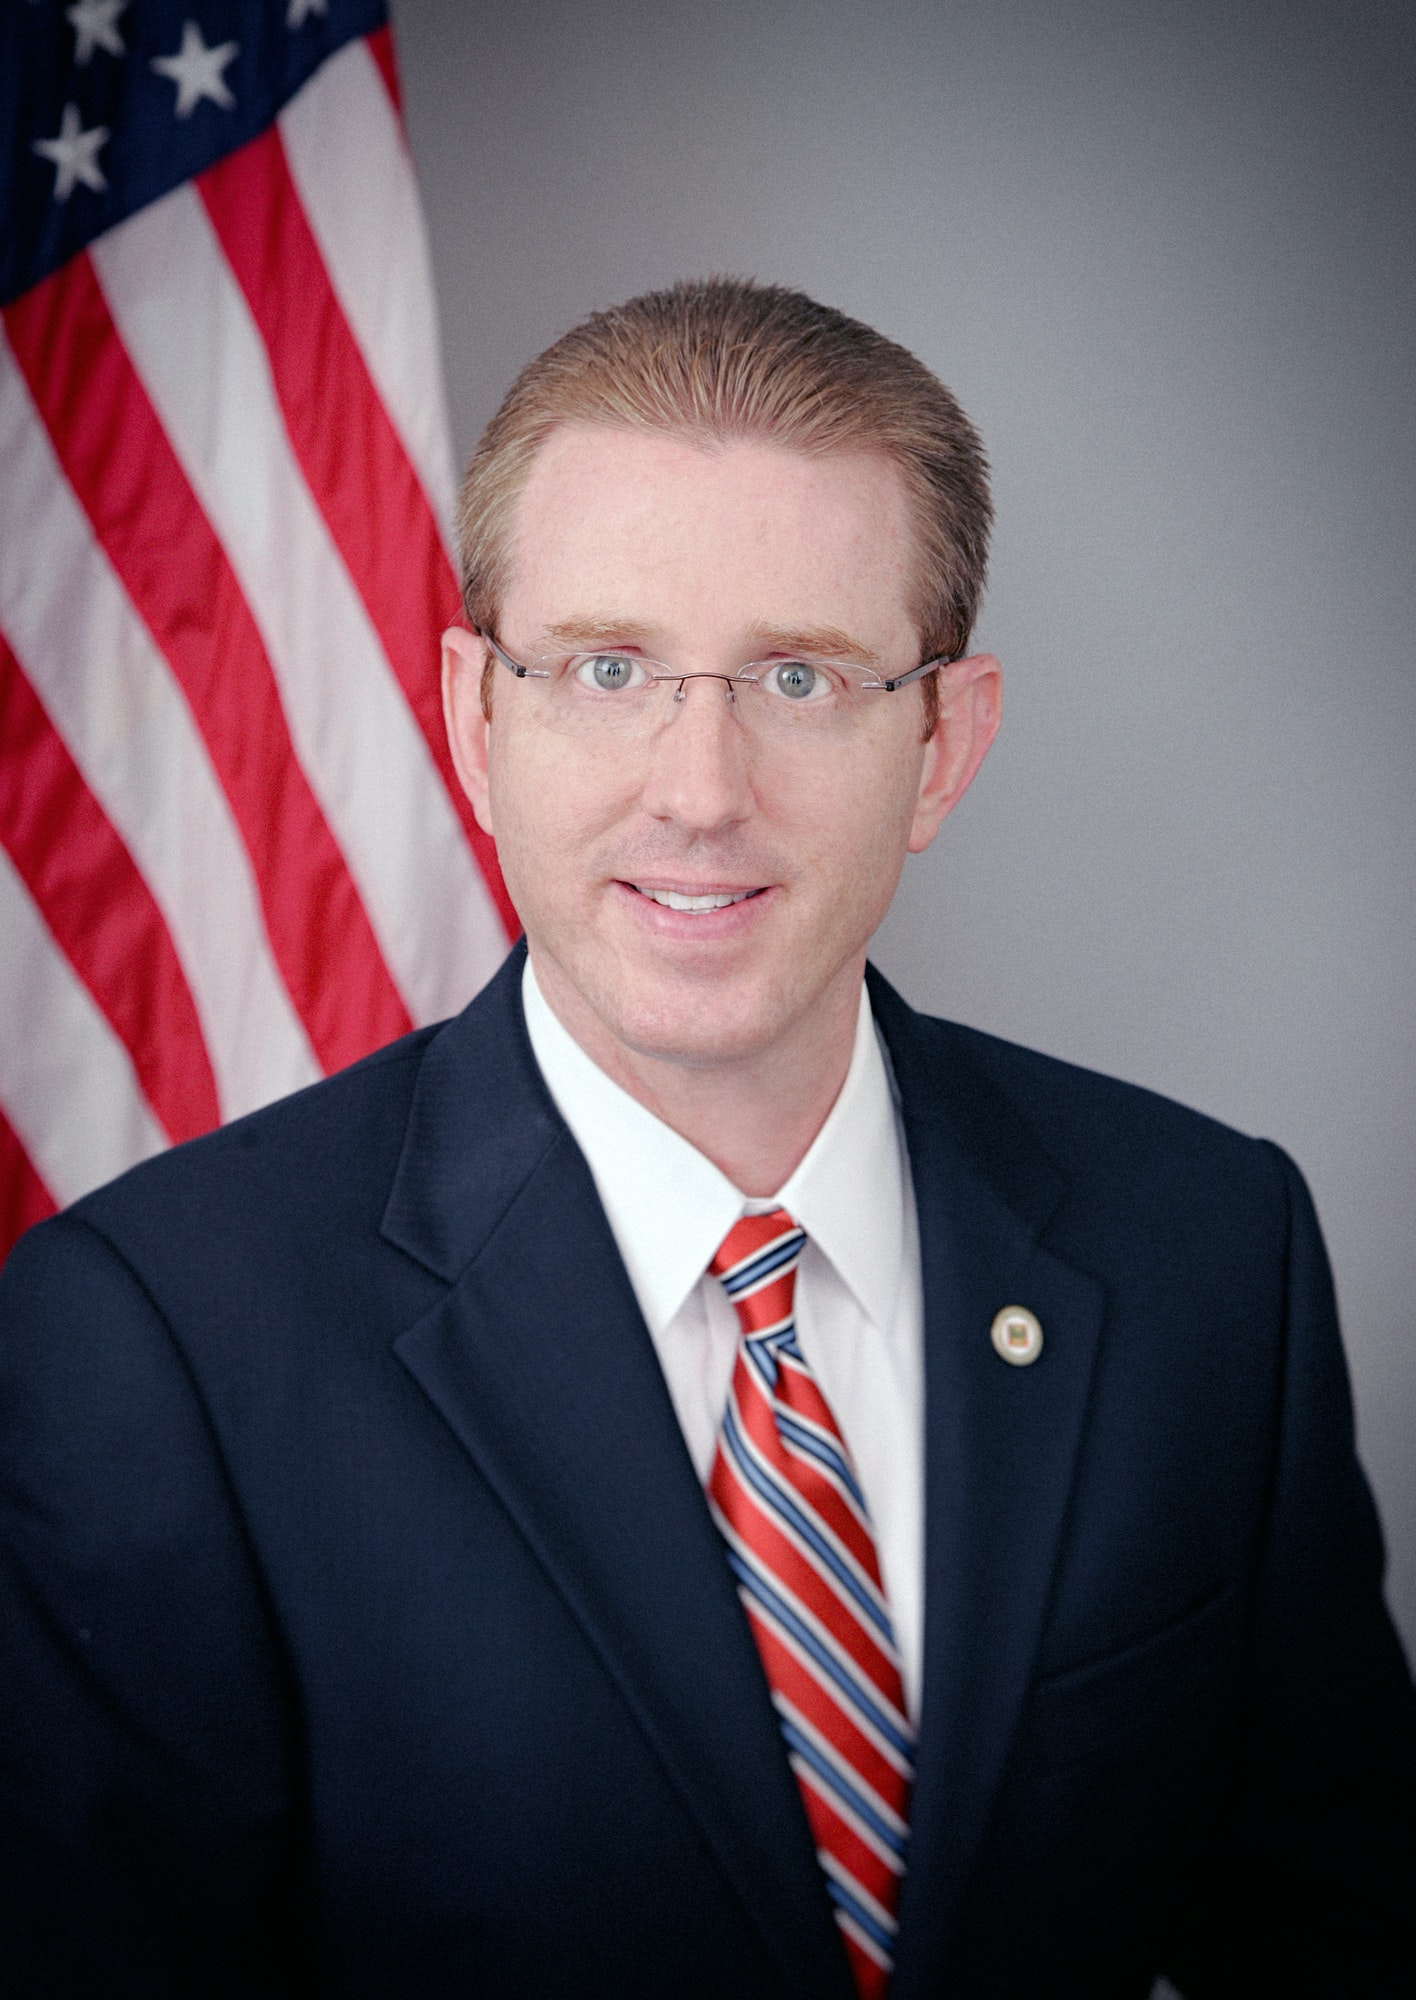 Board treasurer John McGovern